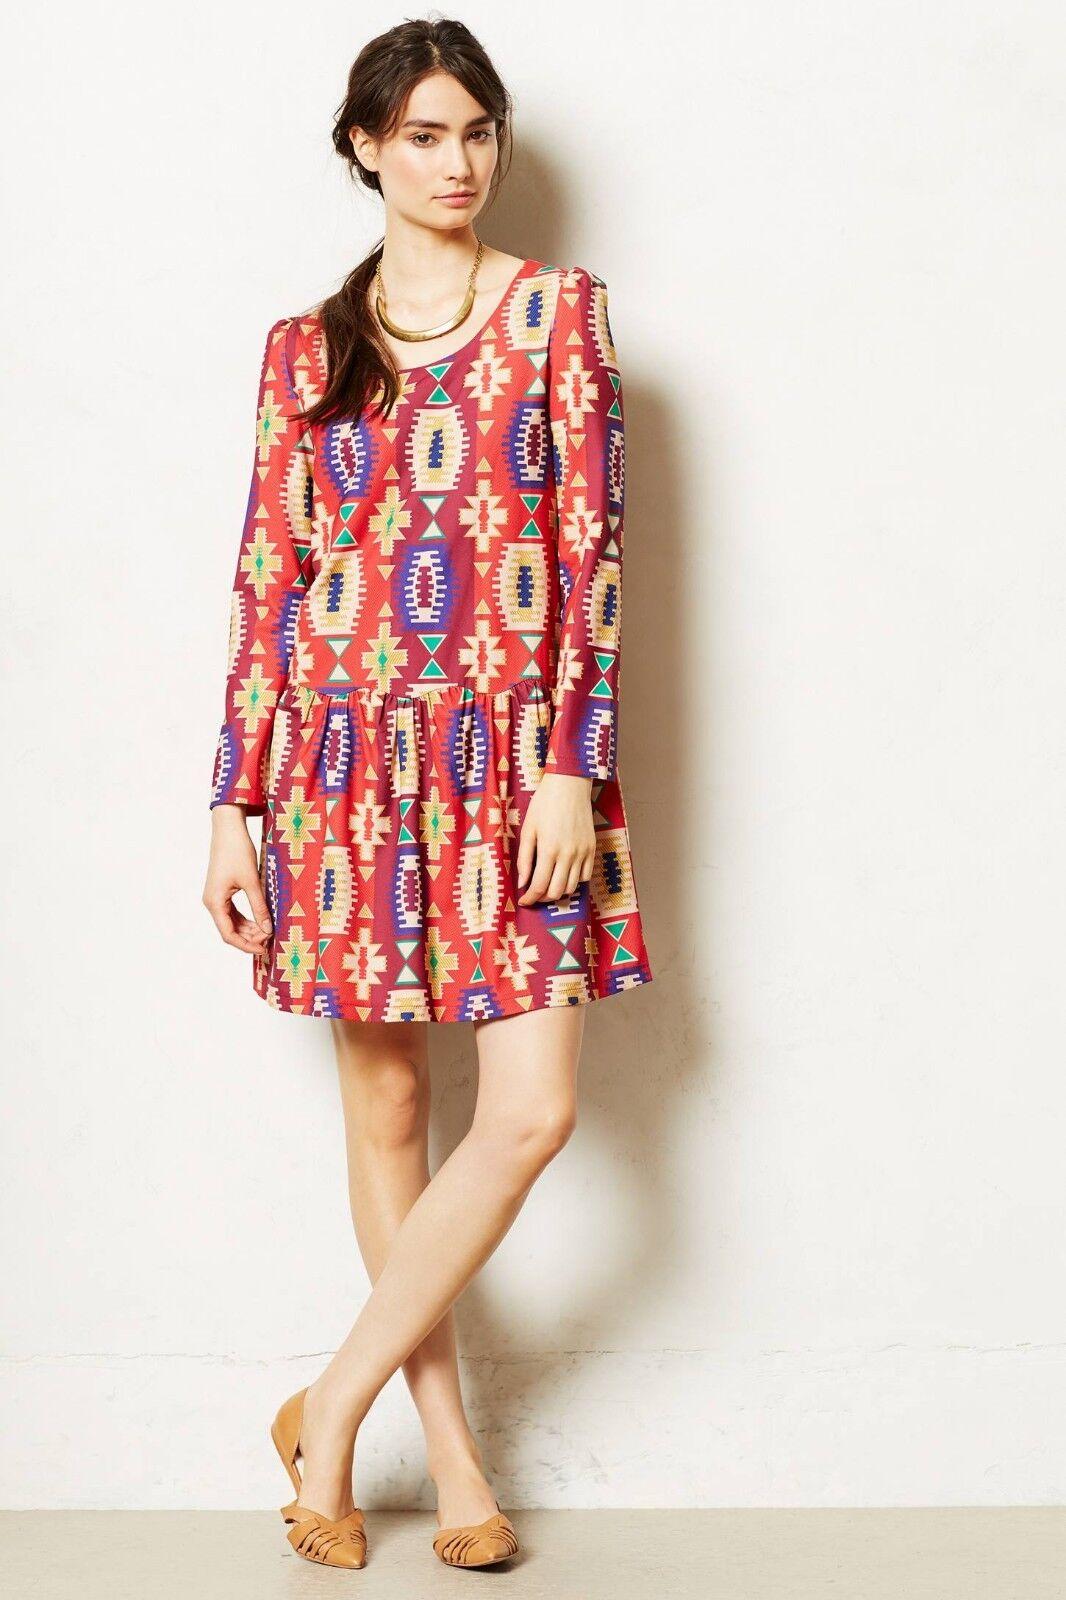 NIP Anthropologie Wildfires Dress by Eyedoll, Größes, rot, , fun & cute